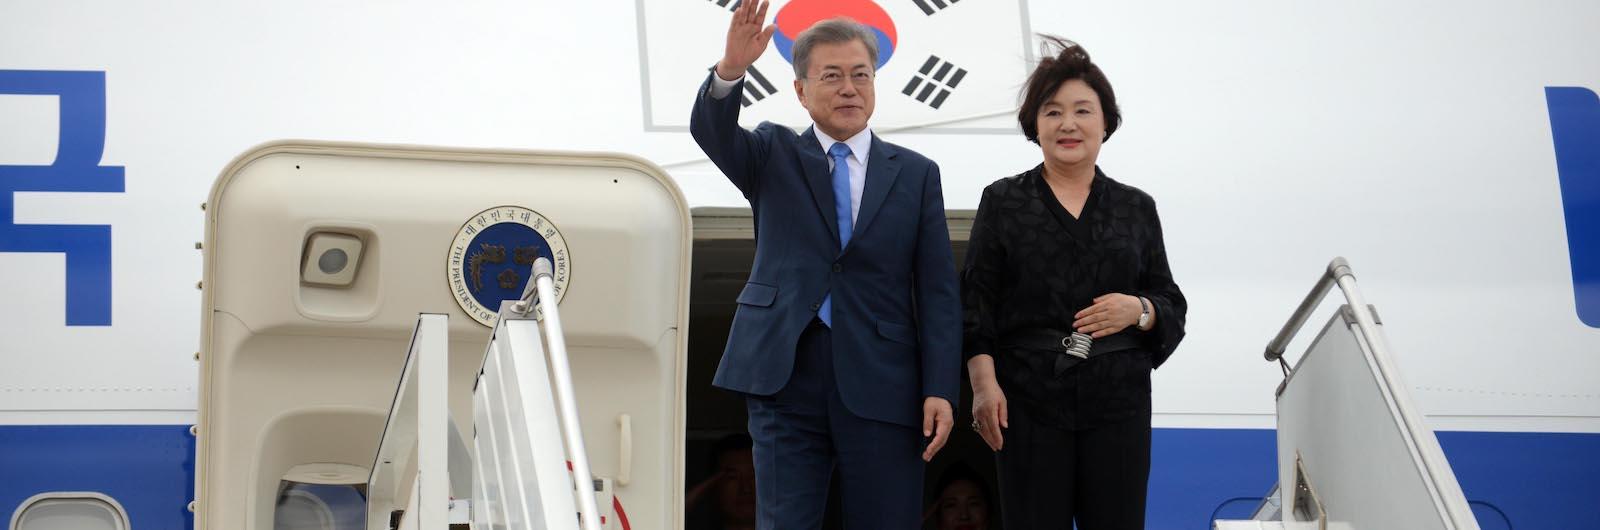 President of South Korea Moon Jae-in (Photo: G20 Argentina/ Flickr)